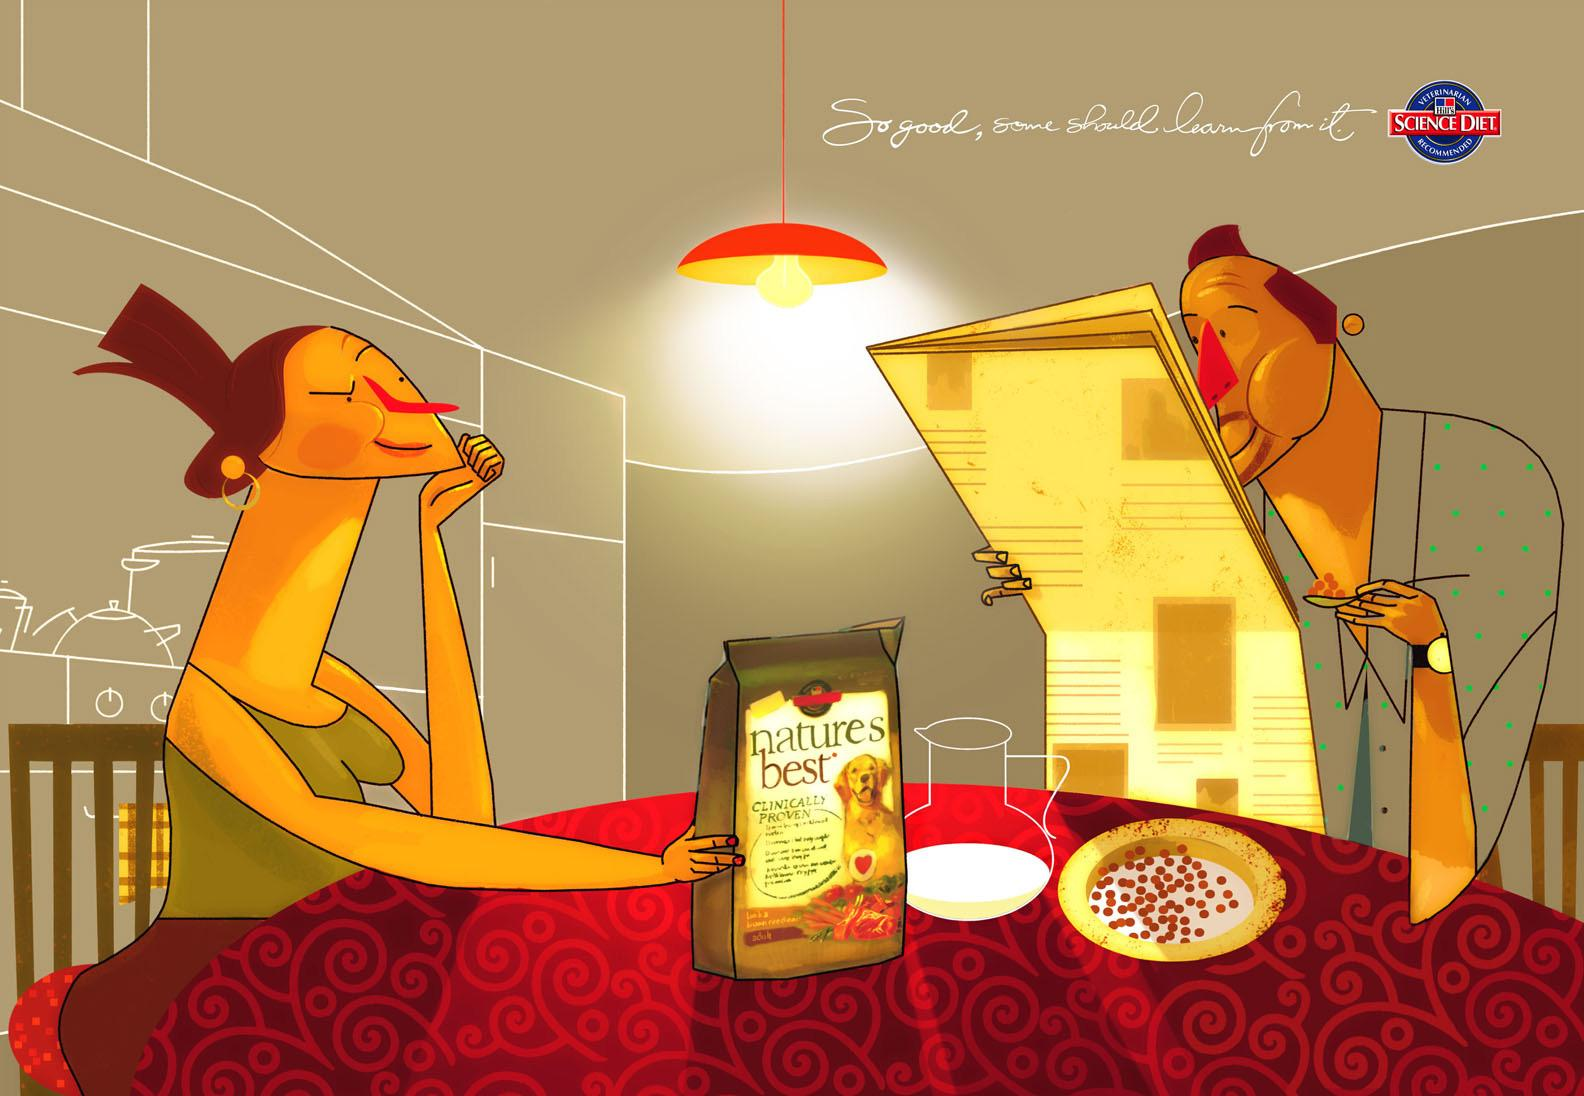 Science Diet Print Ad -  Husband